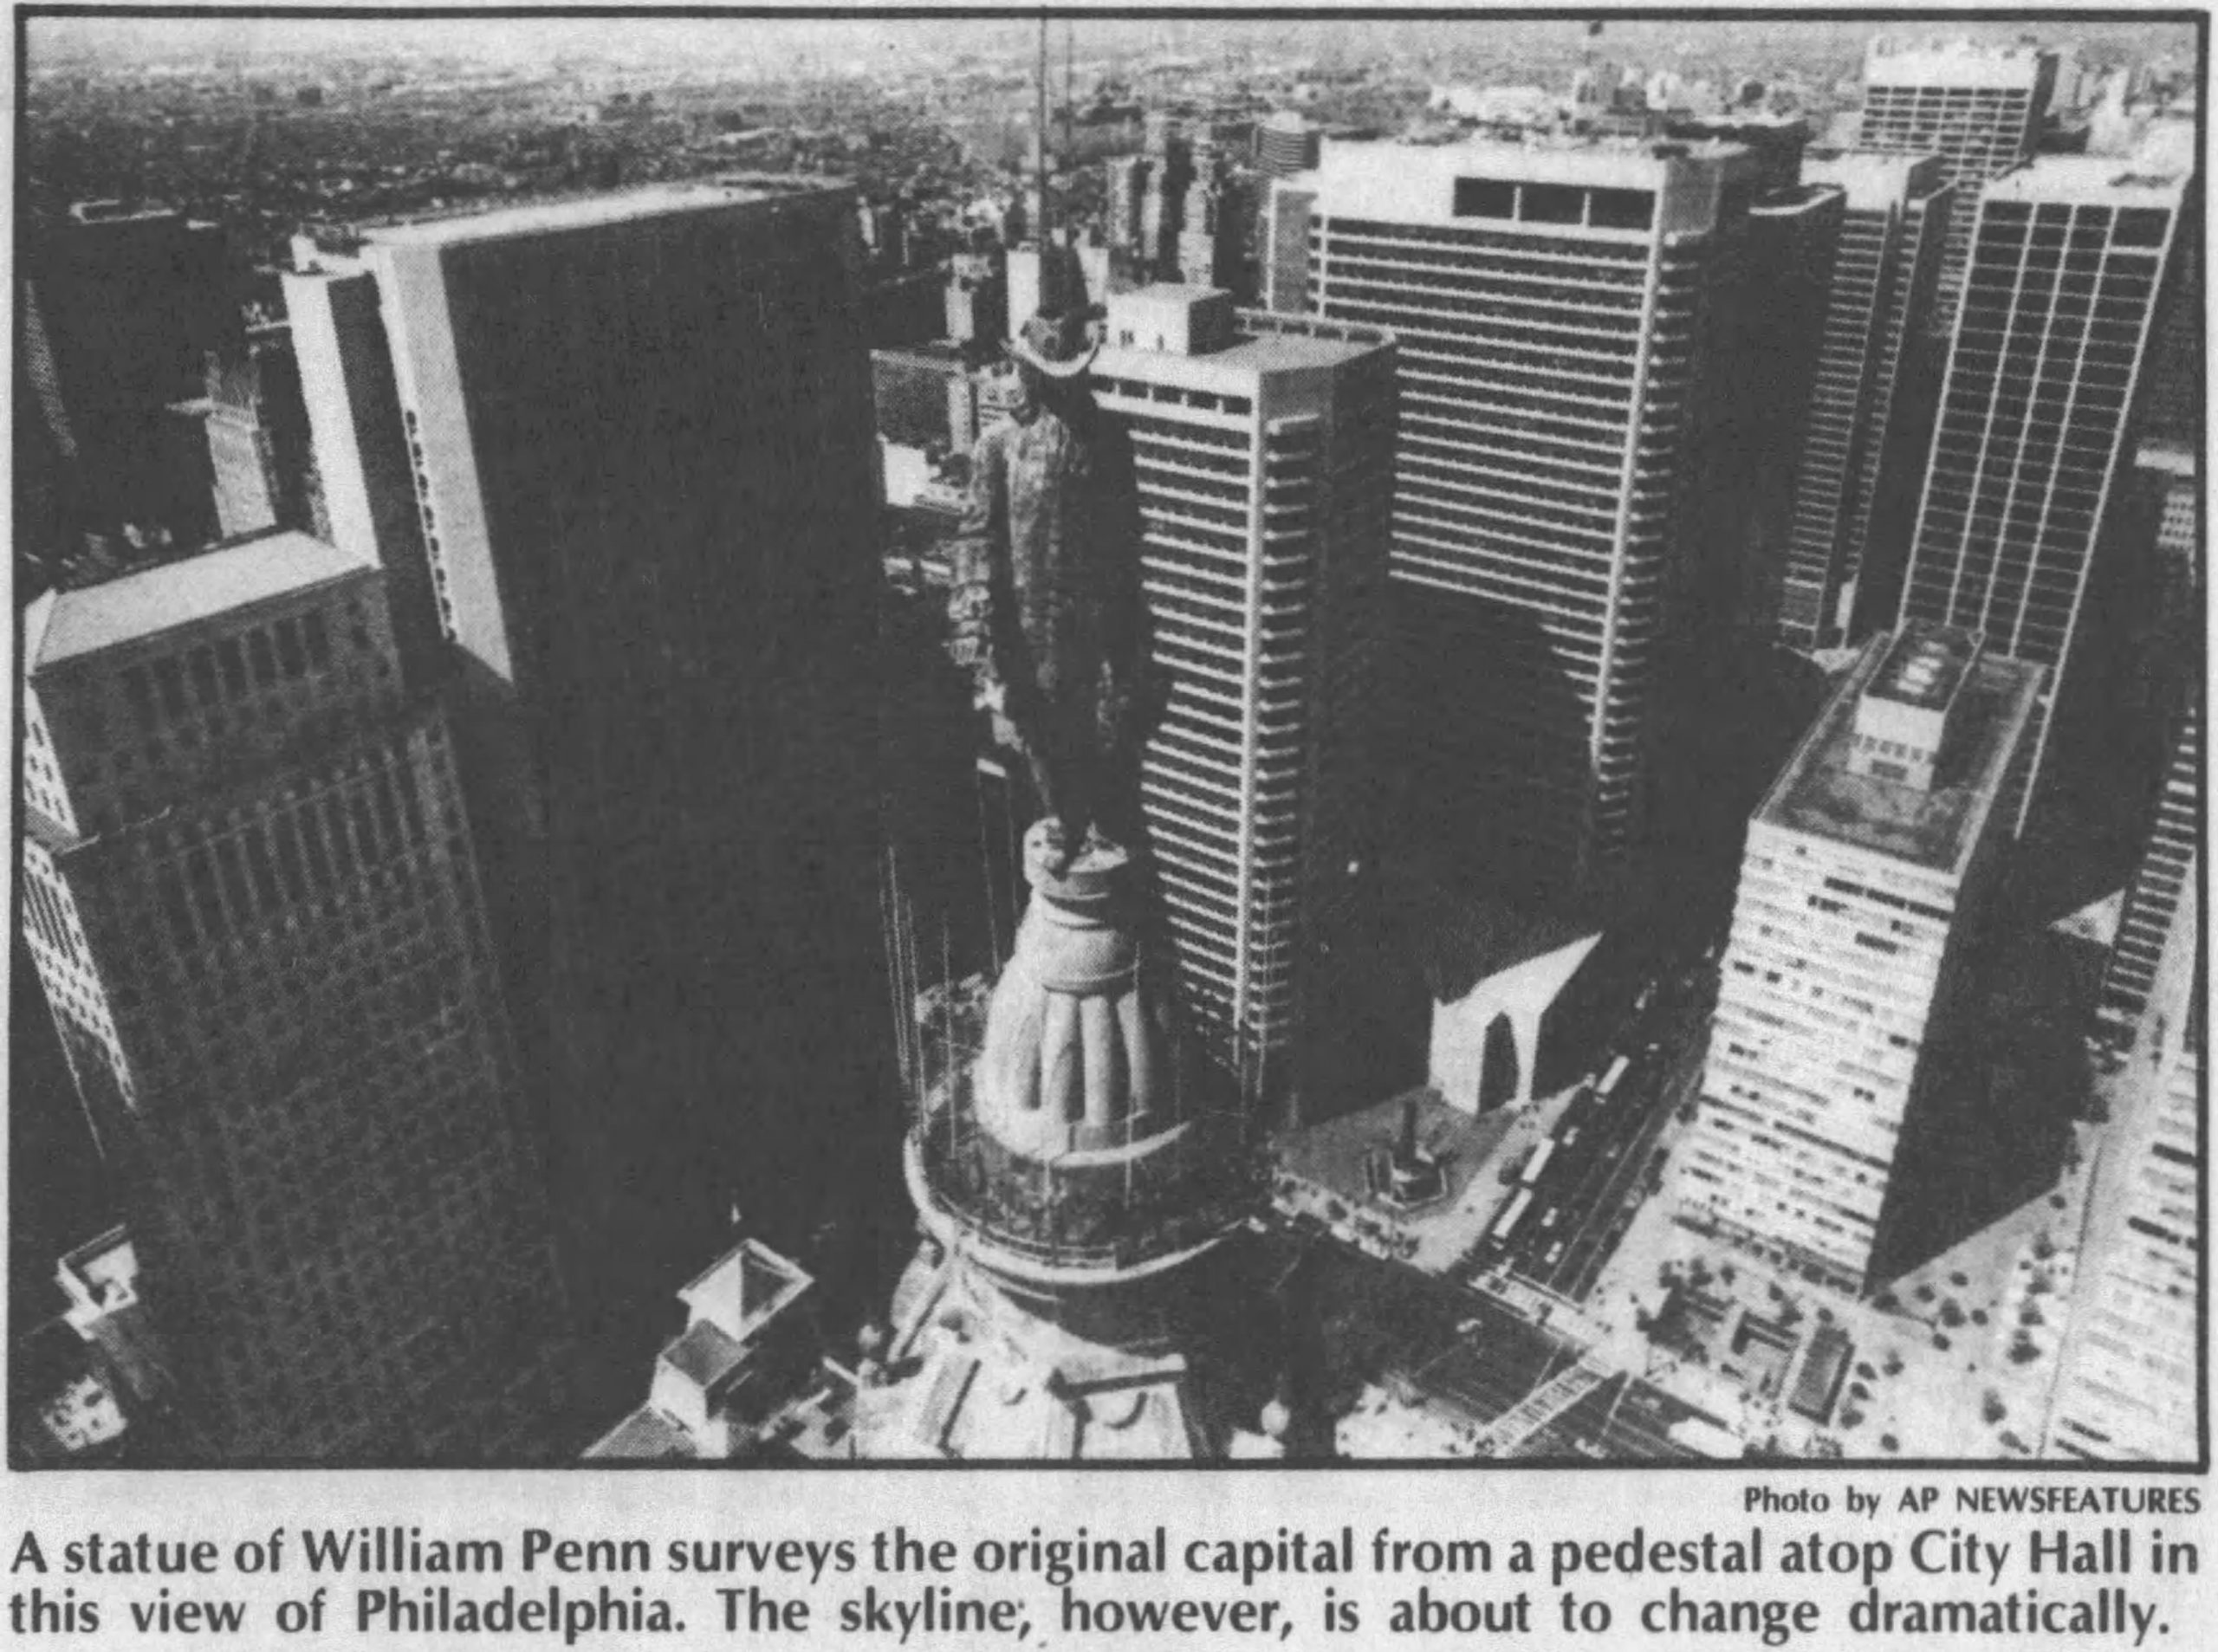 One Meridian Plaza (left) in the Philadelphia skyline. Photo via Daily Press